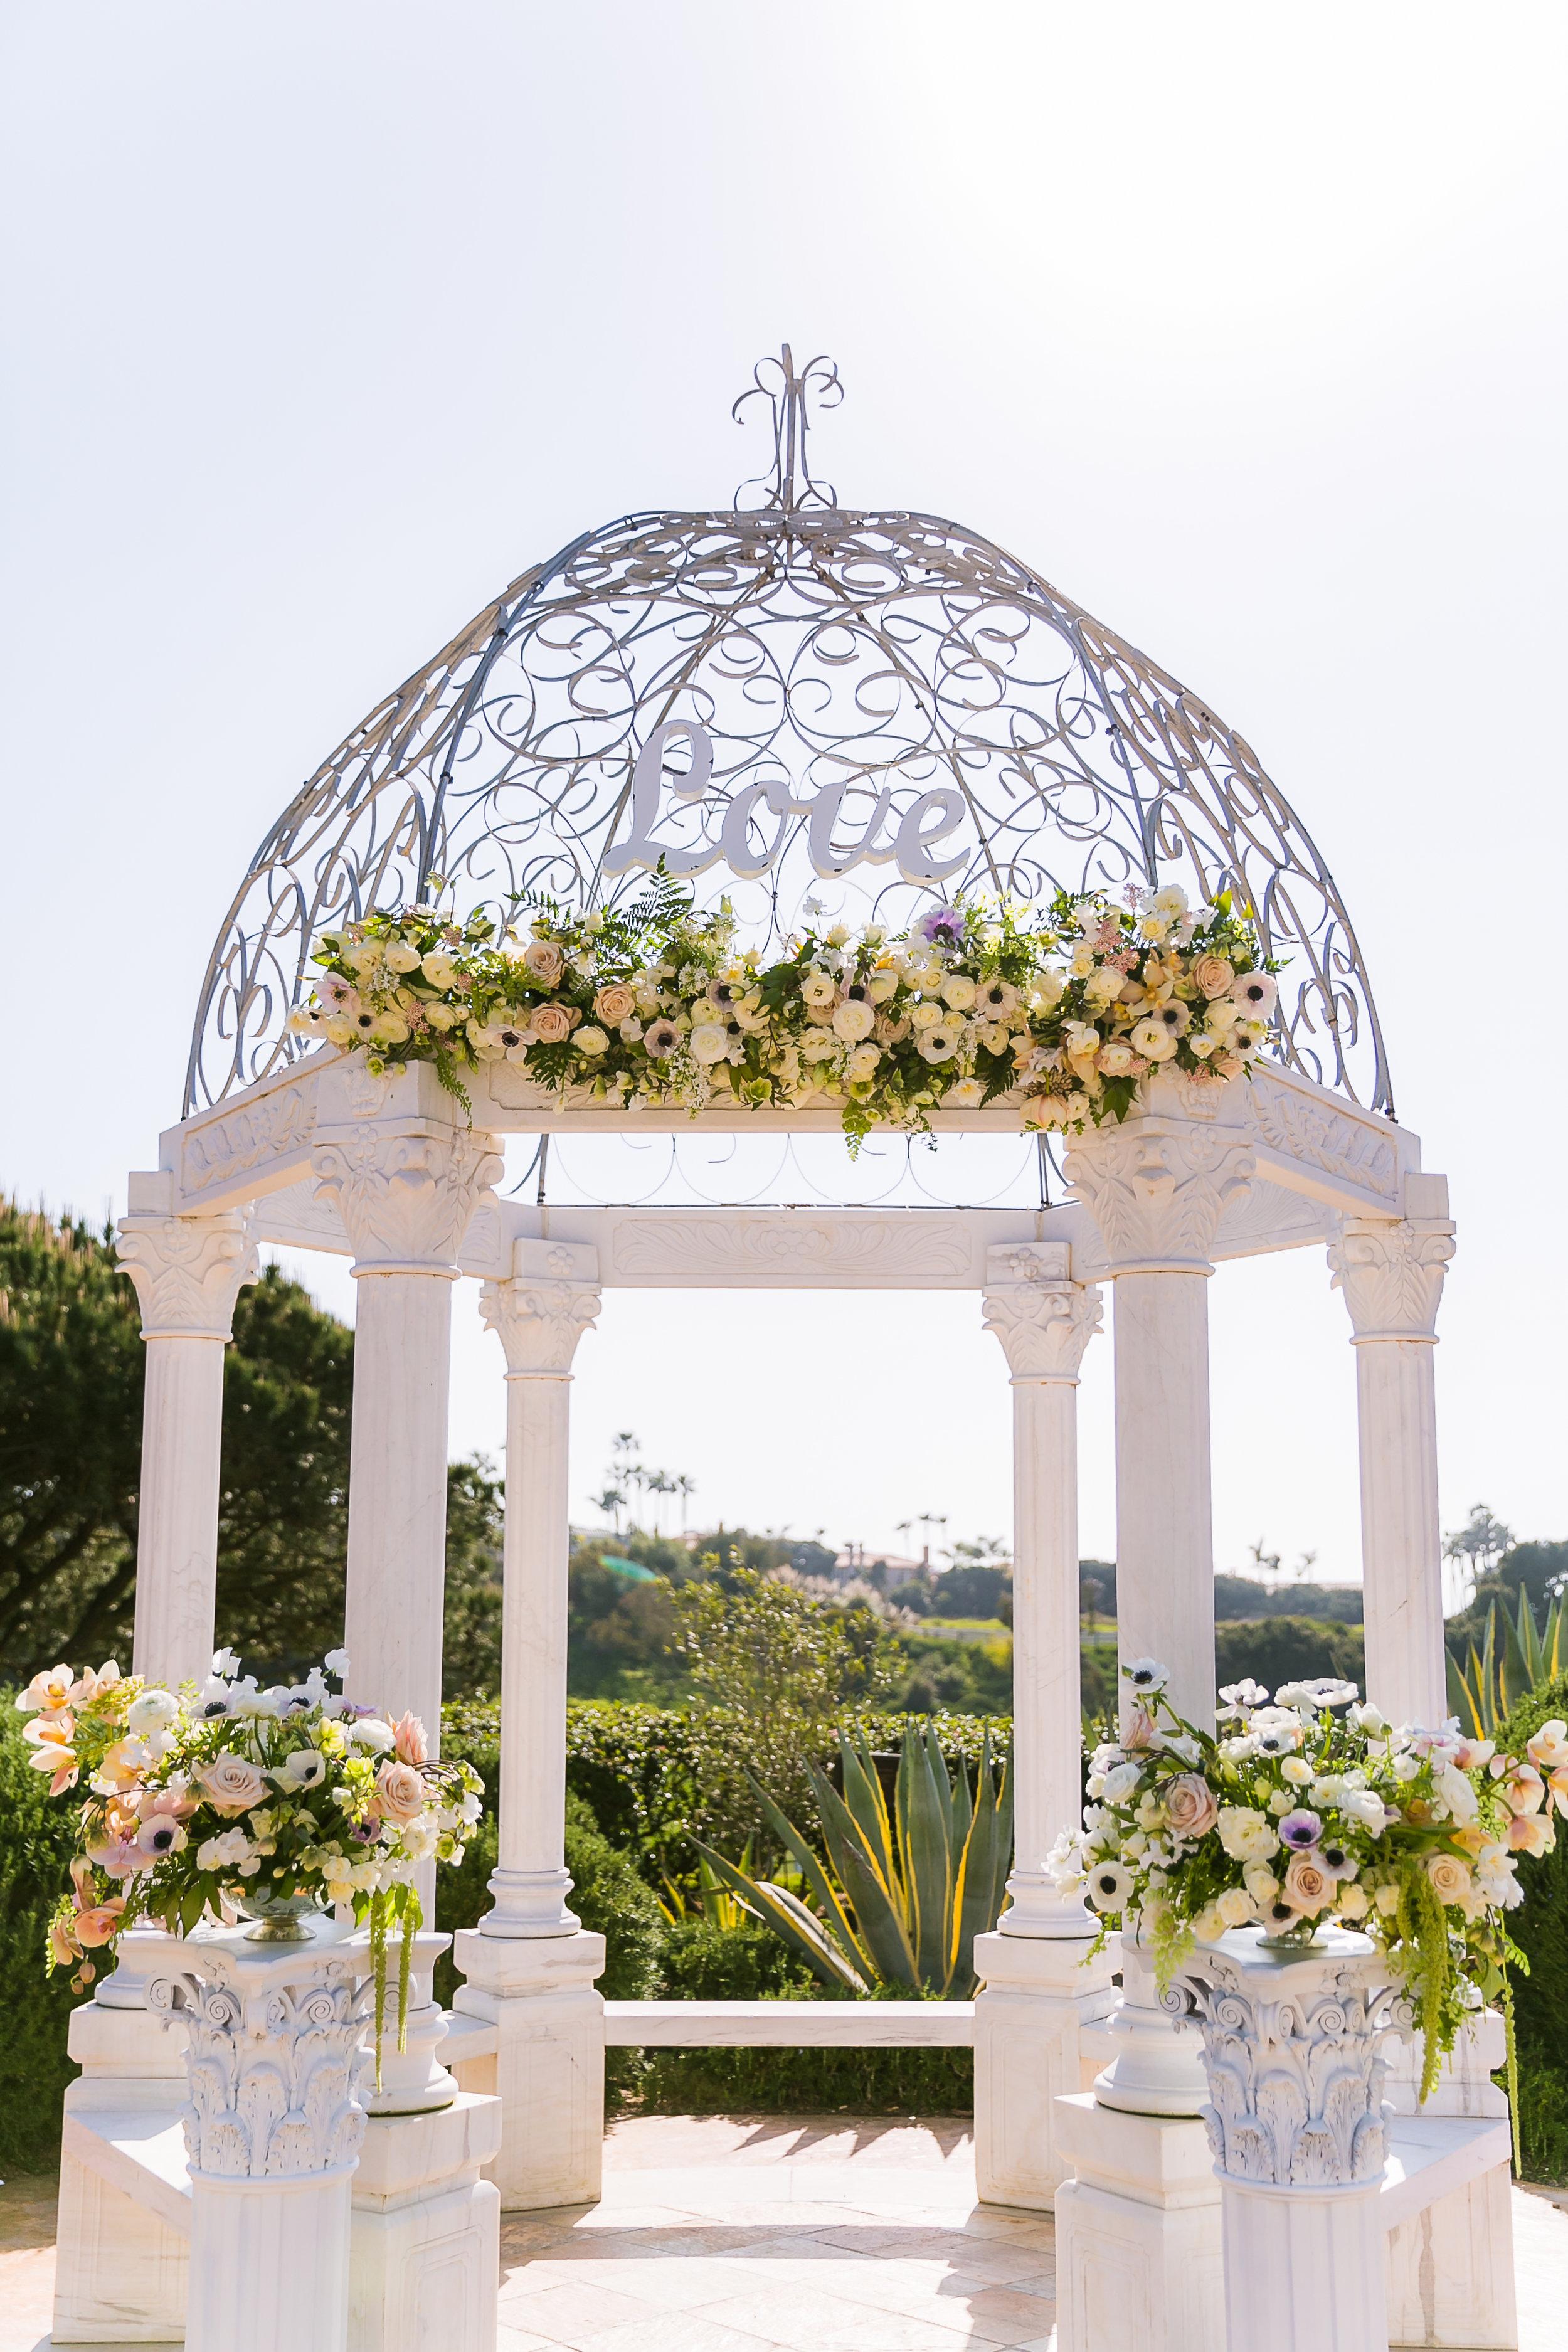 AV-St.Regis-Monarch-Bay-Resort-Dana-Point-Wedding-Photography 175.jpg